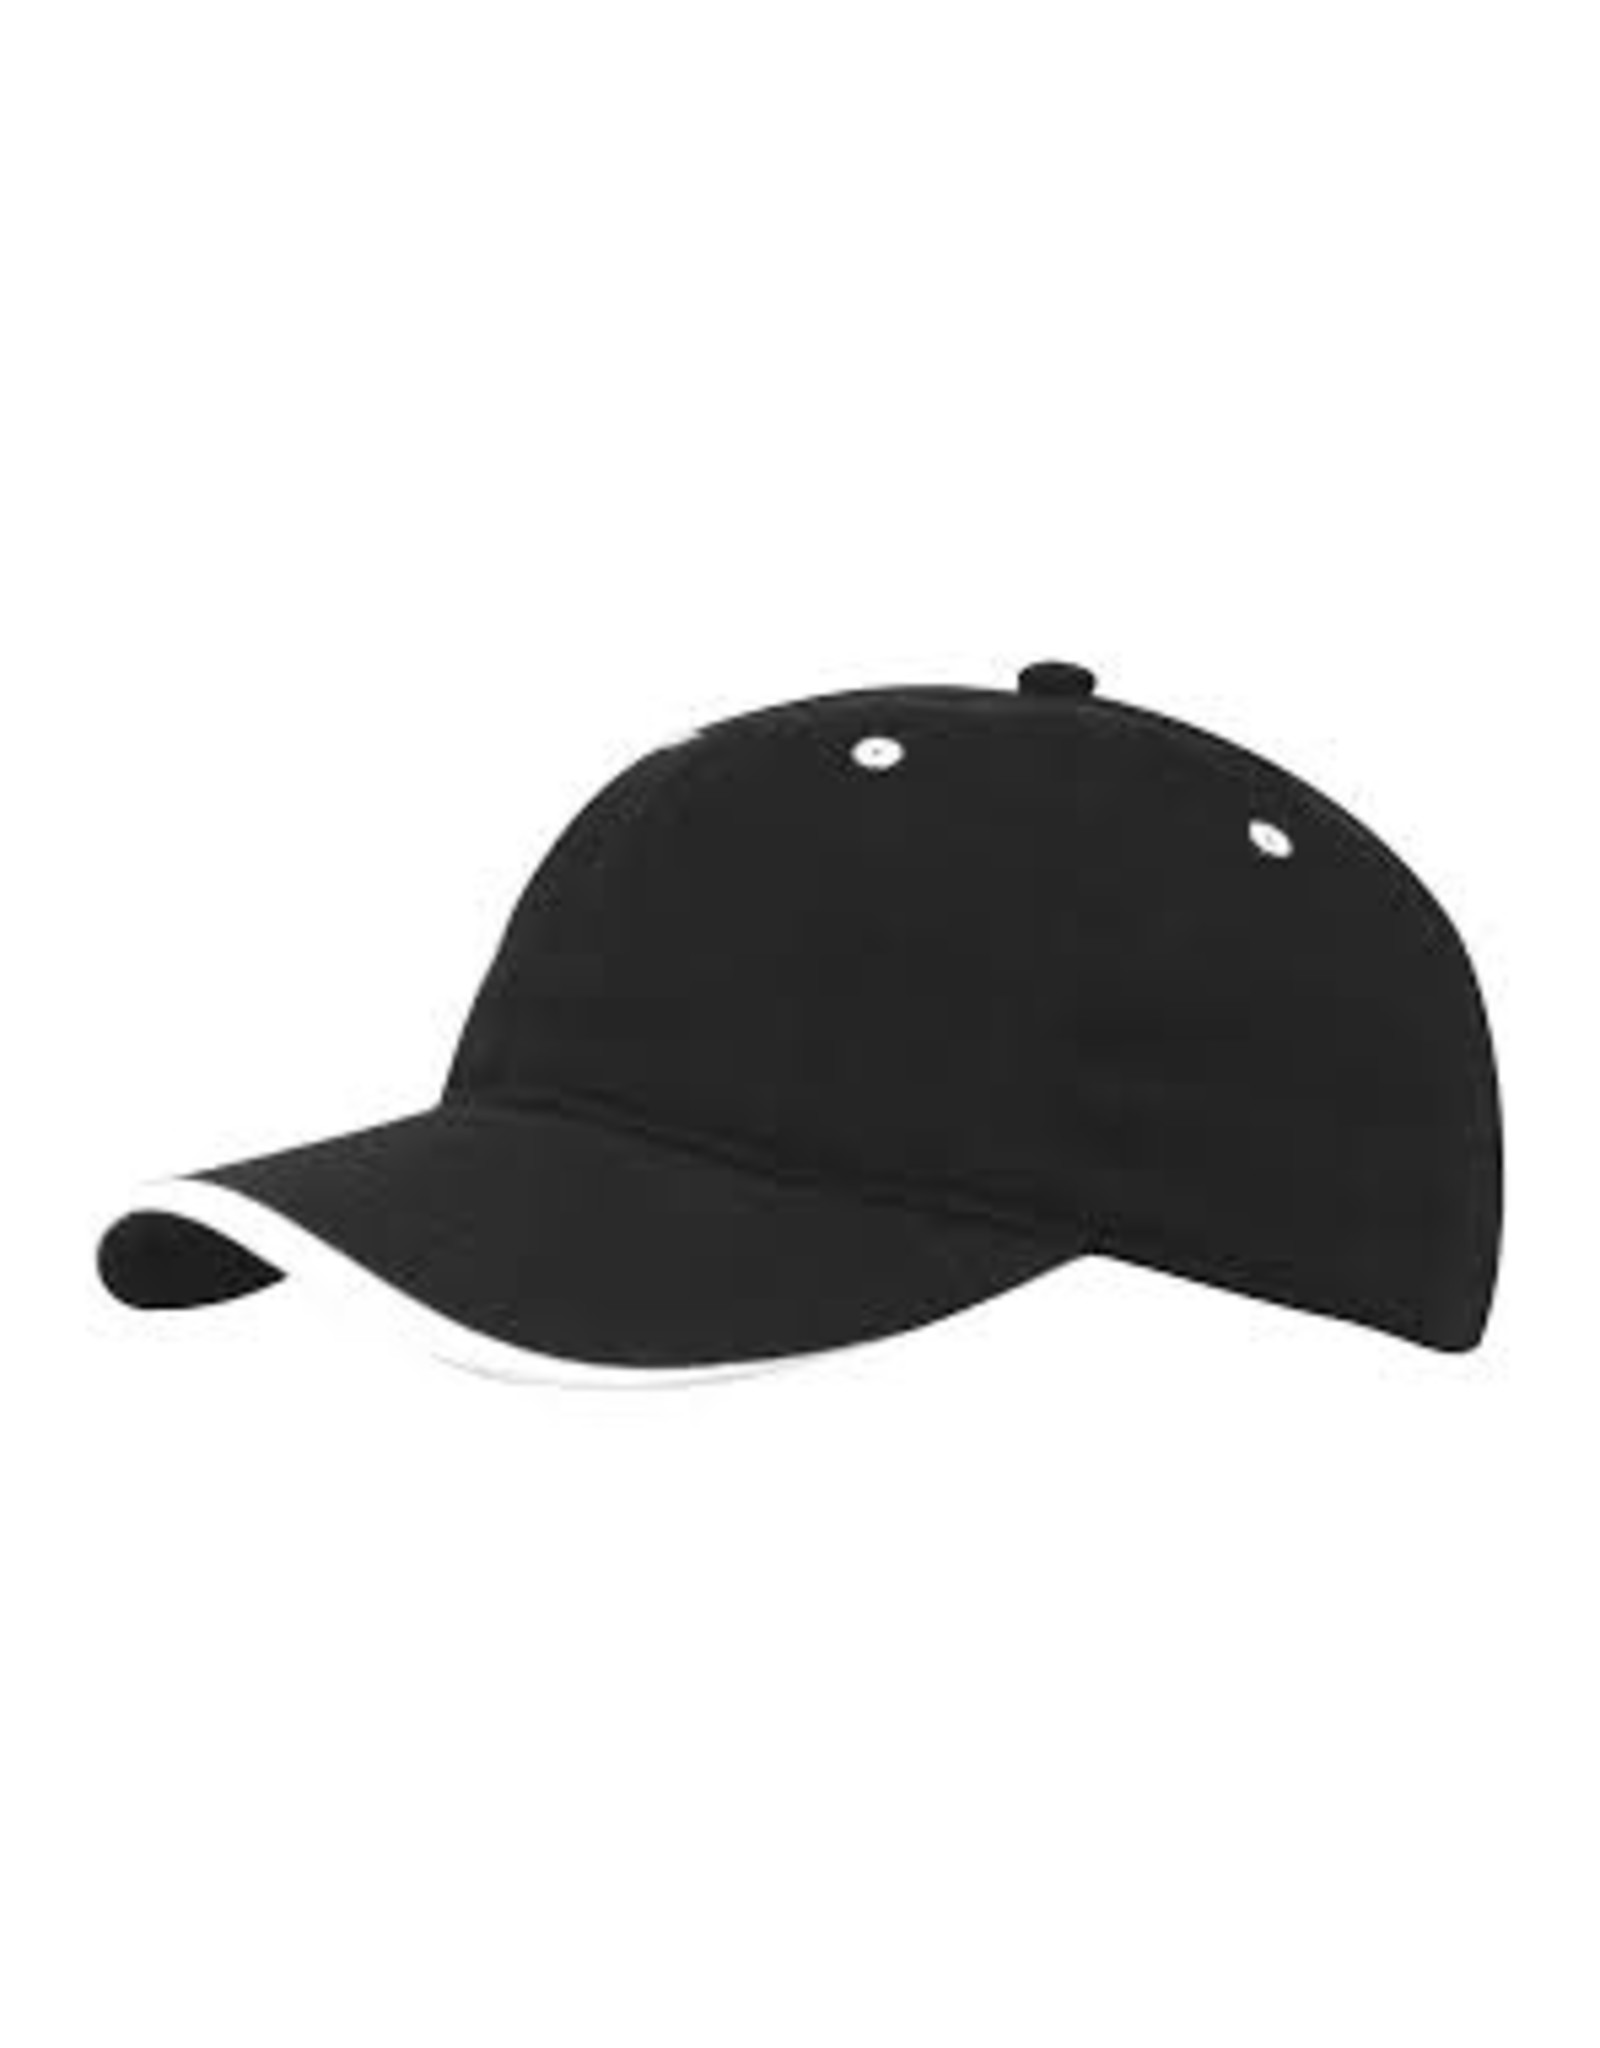 KNP Headwear KNP Micro-Brushed Cap